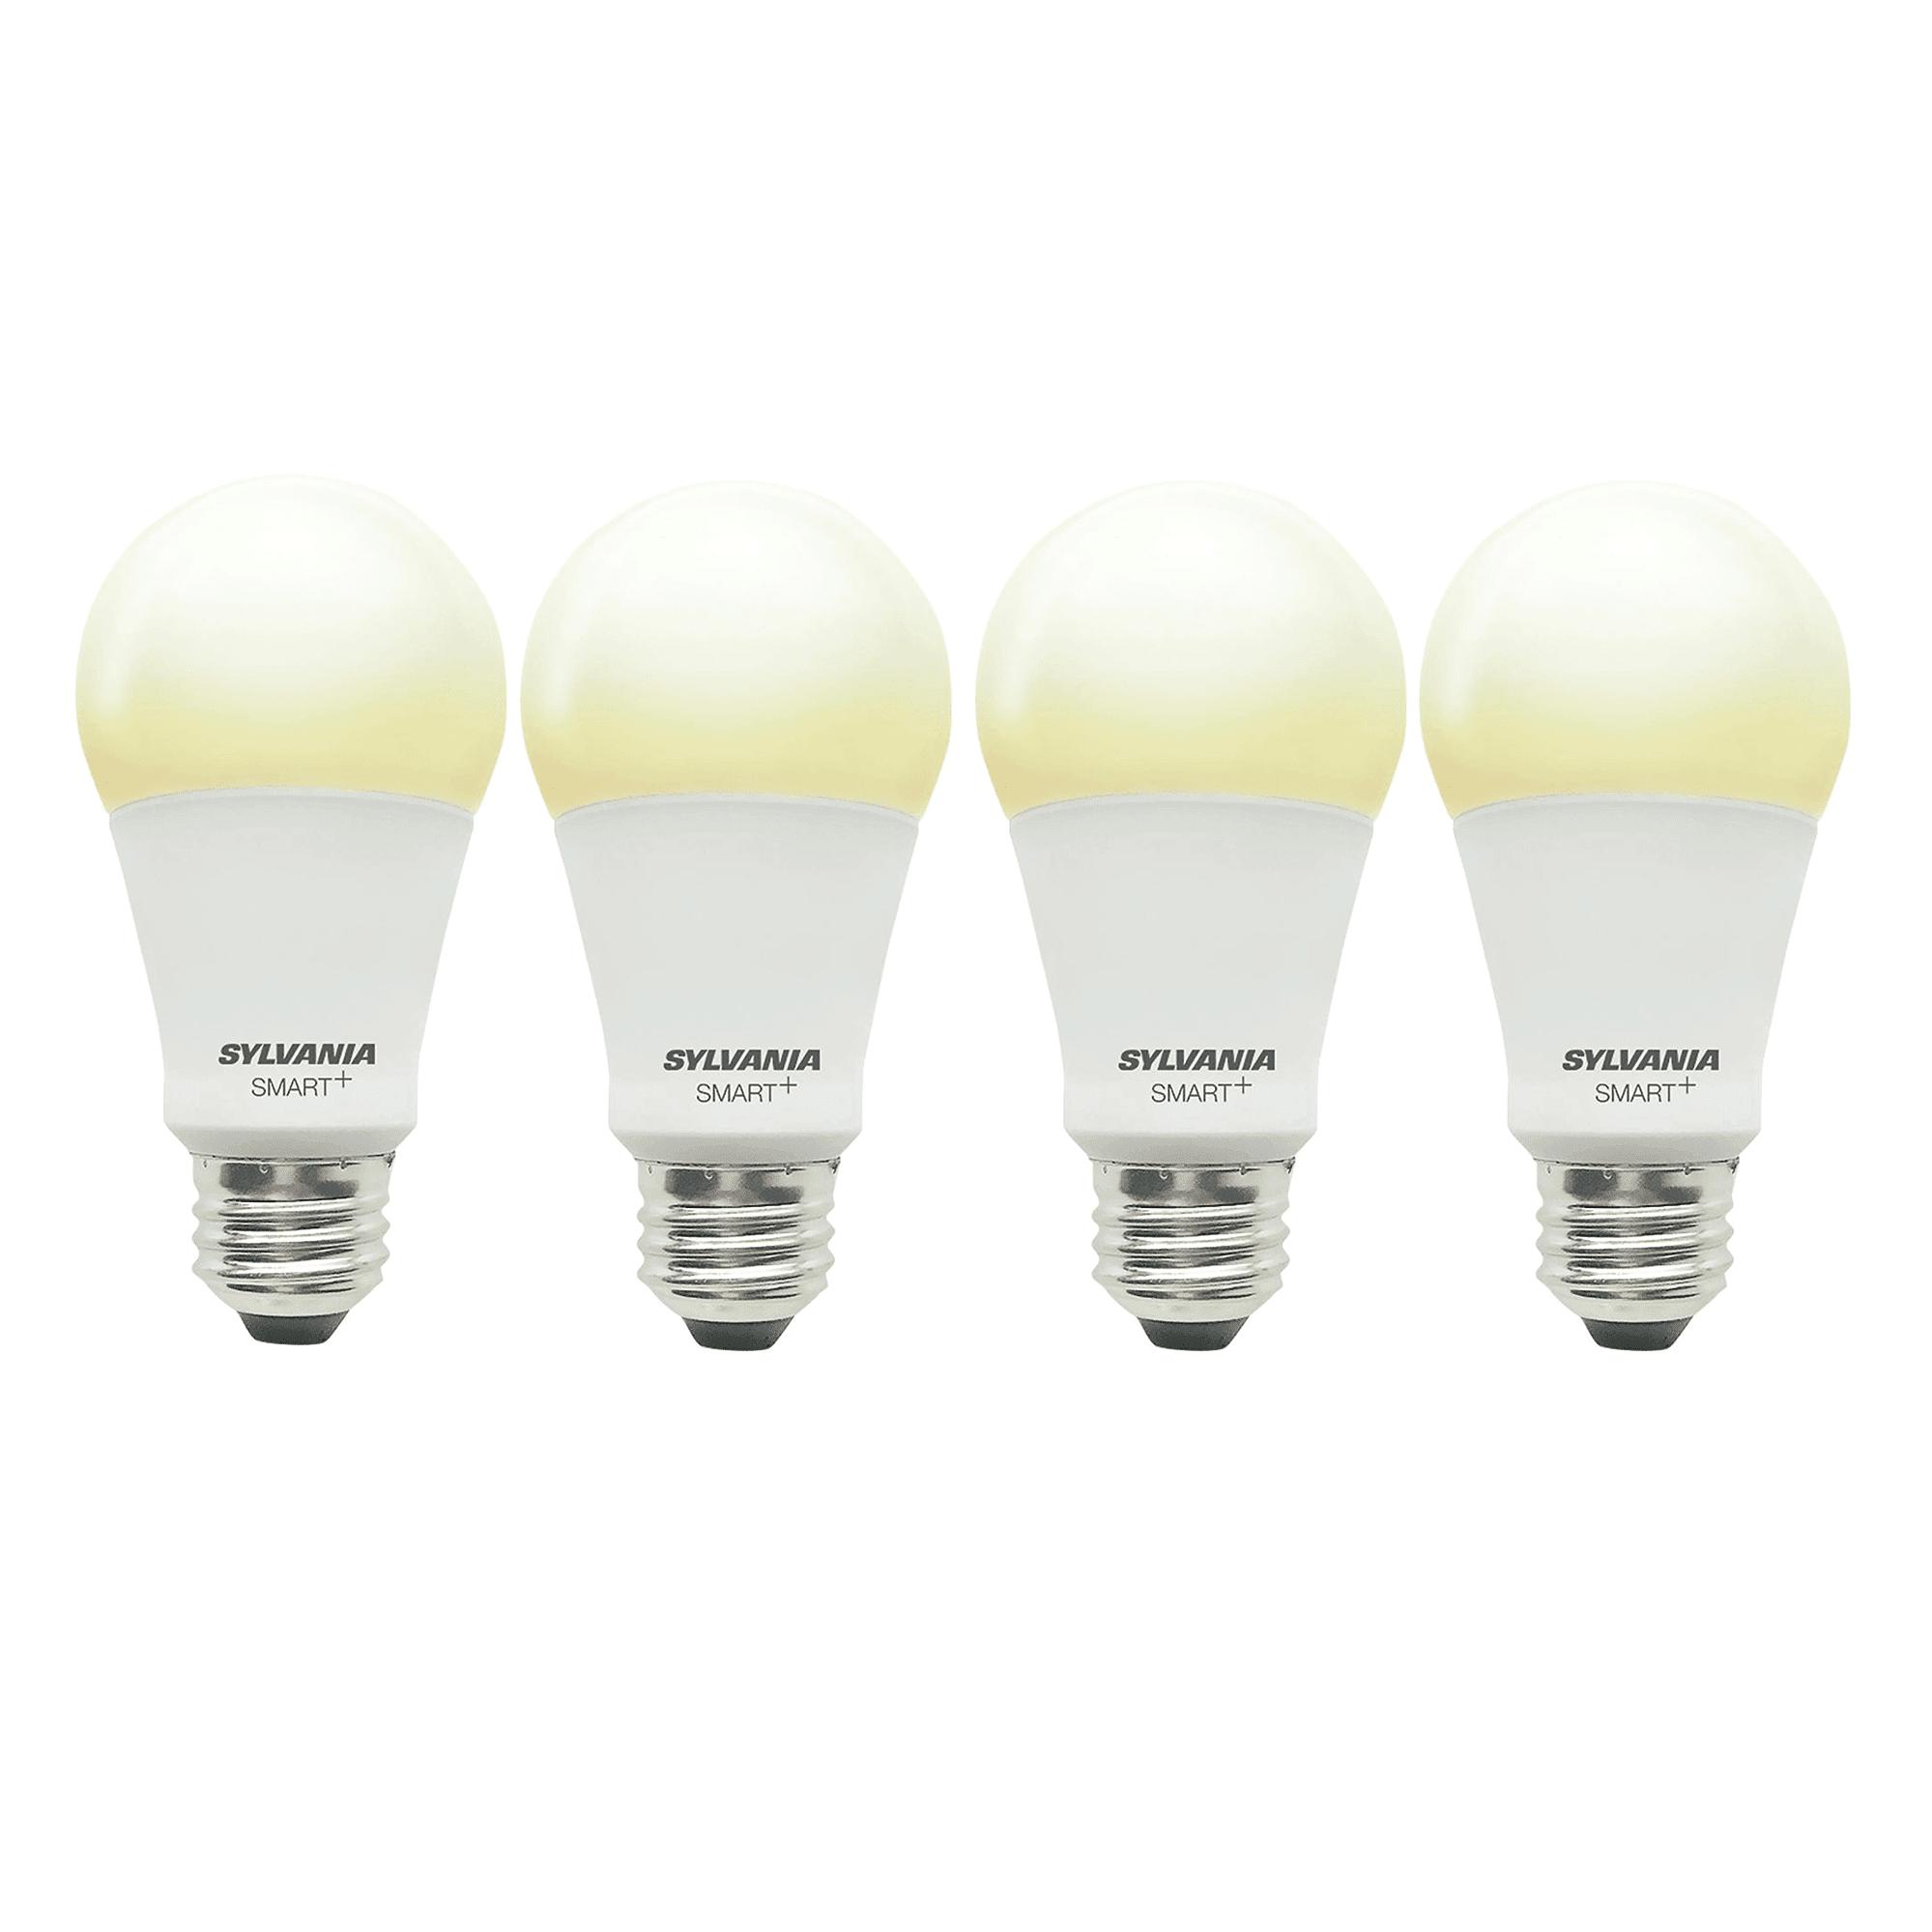 Sylvania Smart+ Bluetooth Soft White A19 LED Light Bulb w/ Apple & Siri (4 Pack)